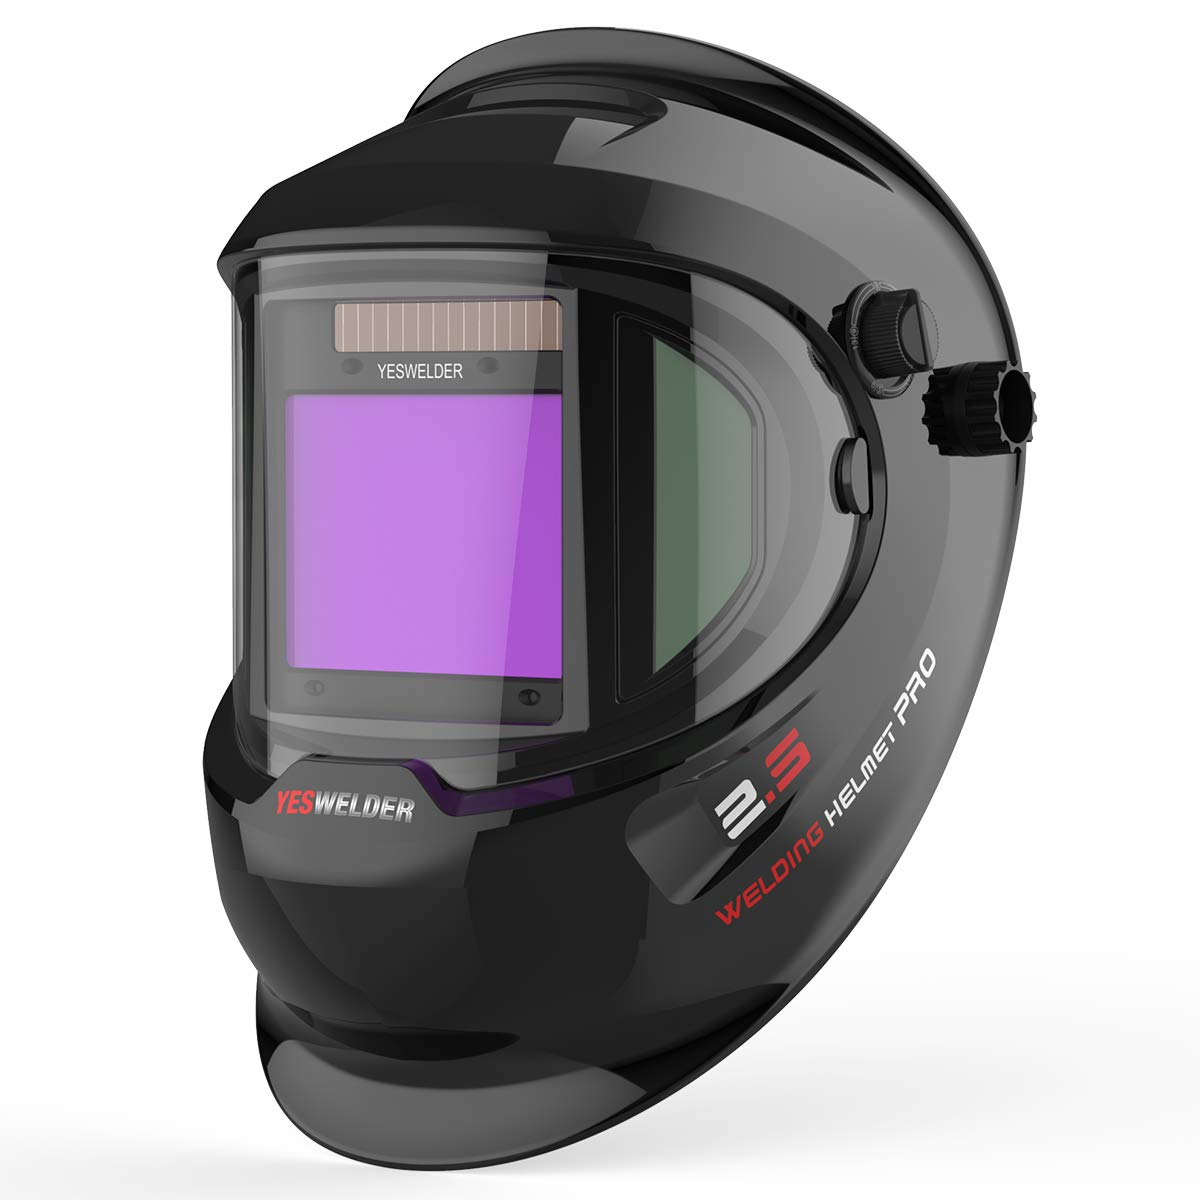 YESWELDER Large Viewing True Color Solar Powered Auto Darkening Welding Helmet with SIDE VIEW, 4 Arc Sensor Wide Shade 4/5-9/9-13 Welder Mask for TIG MIG